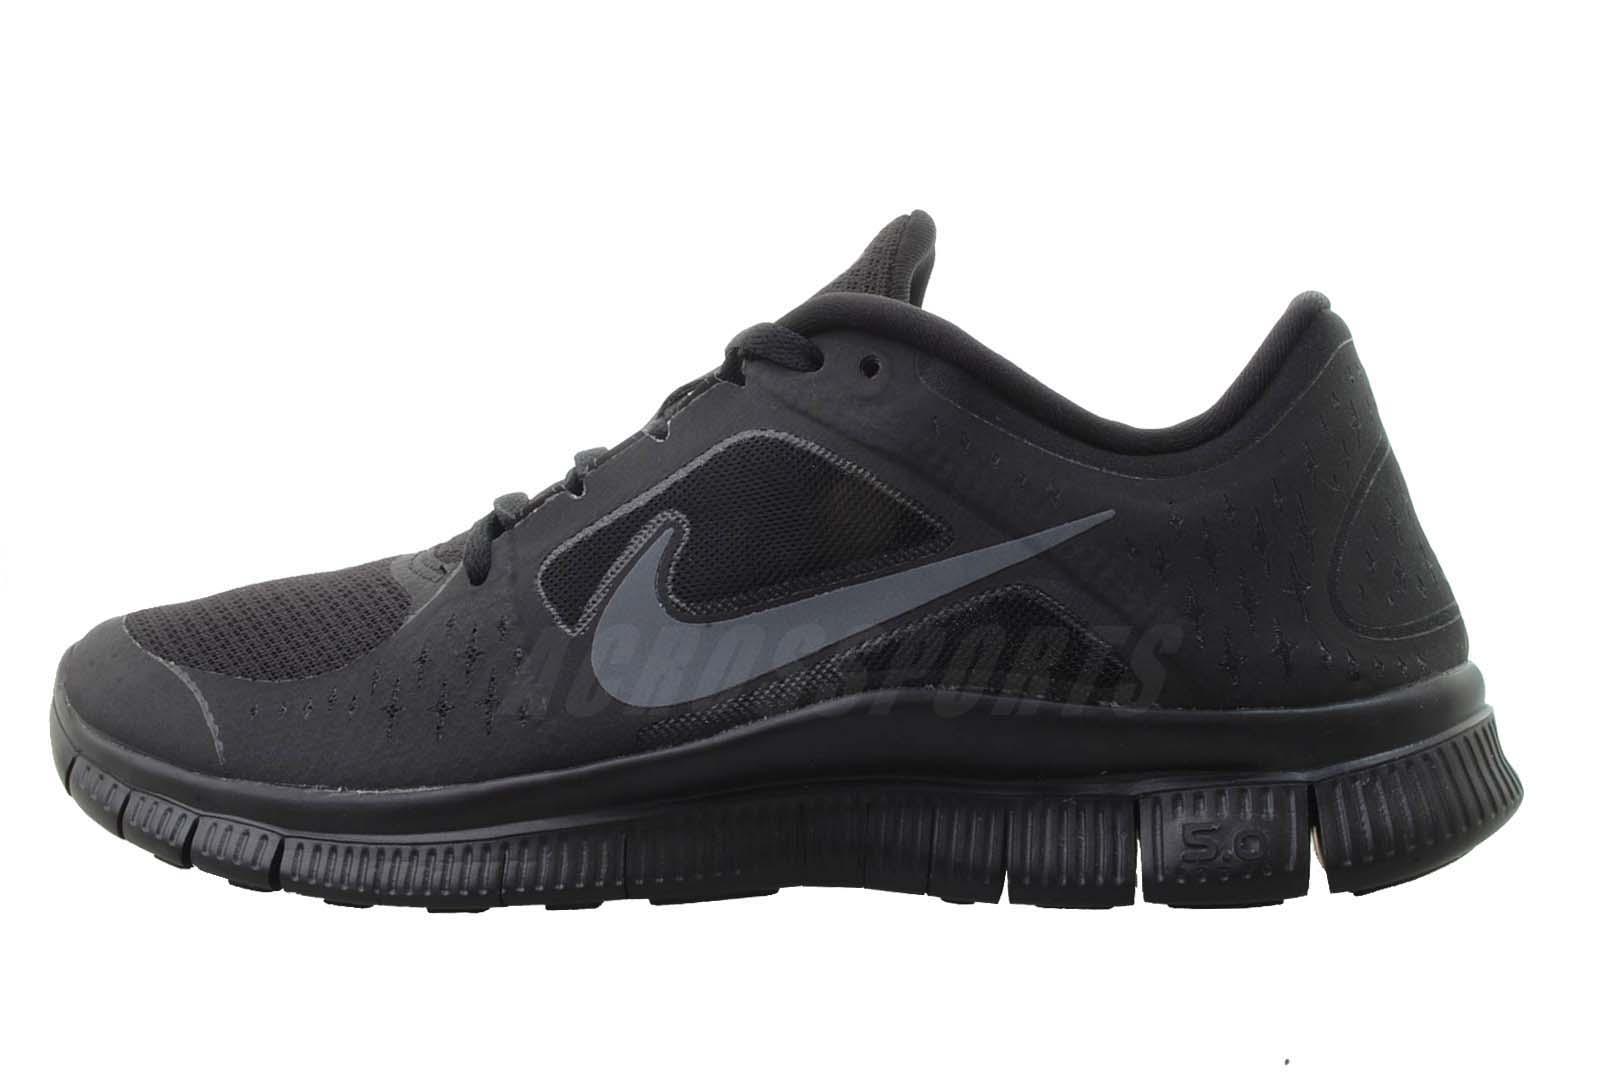 Nike Free Run 3 5.0 Mens Barefoot Lightweight Running ...